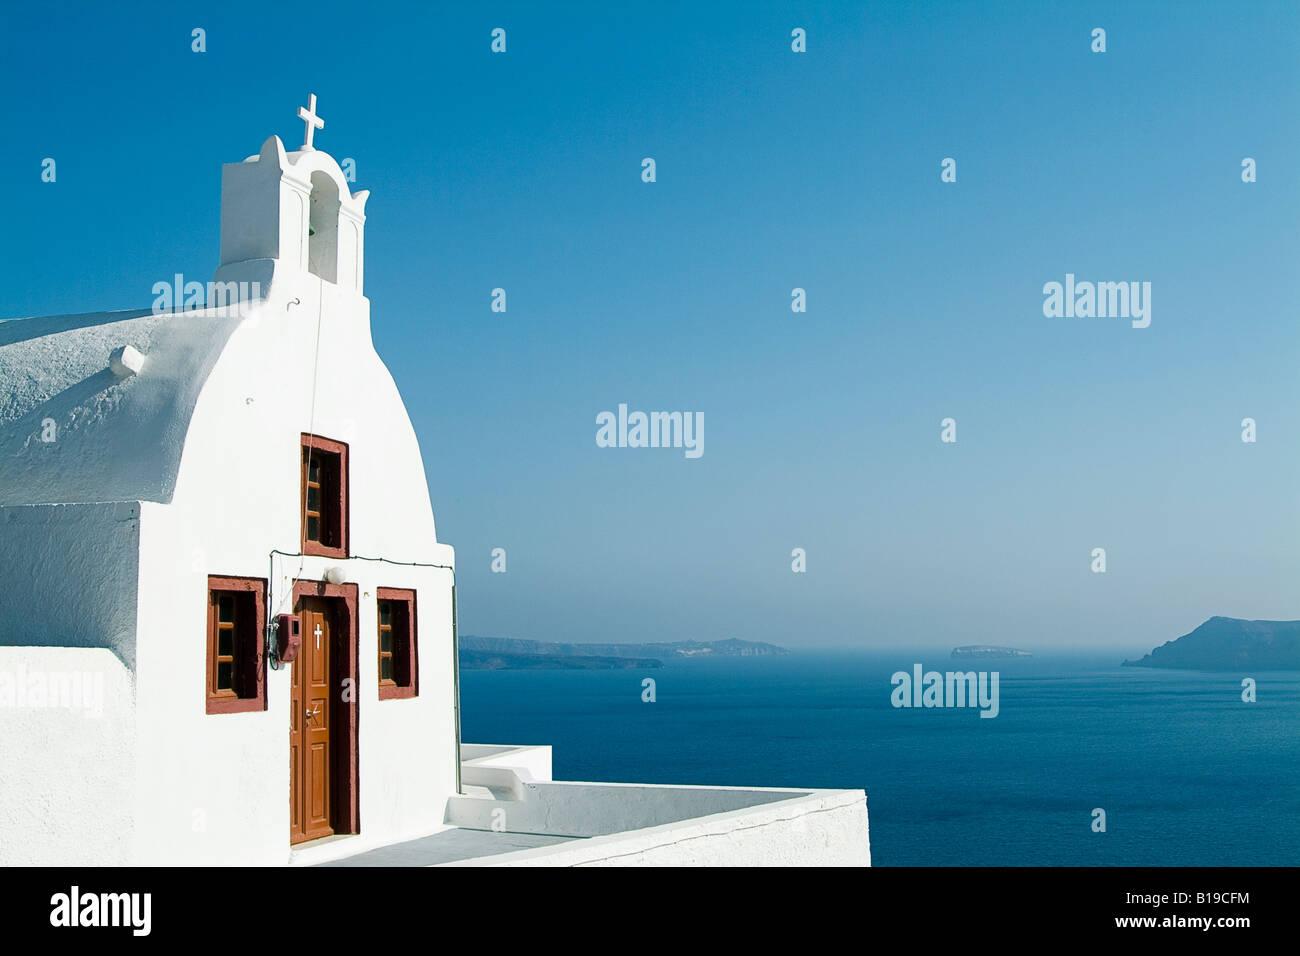 Church overlooking Aegean Sea, Oia, Santorini, Cyclades Islands, Greece. - Stock Image